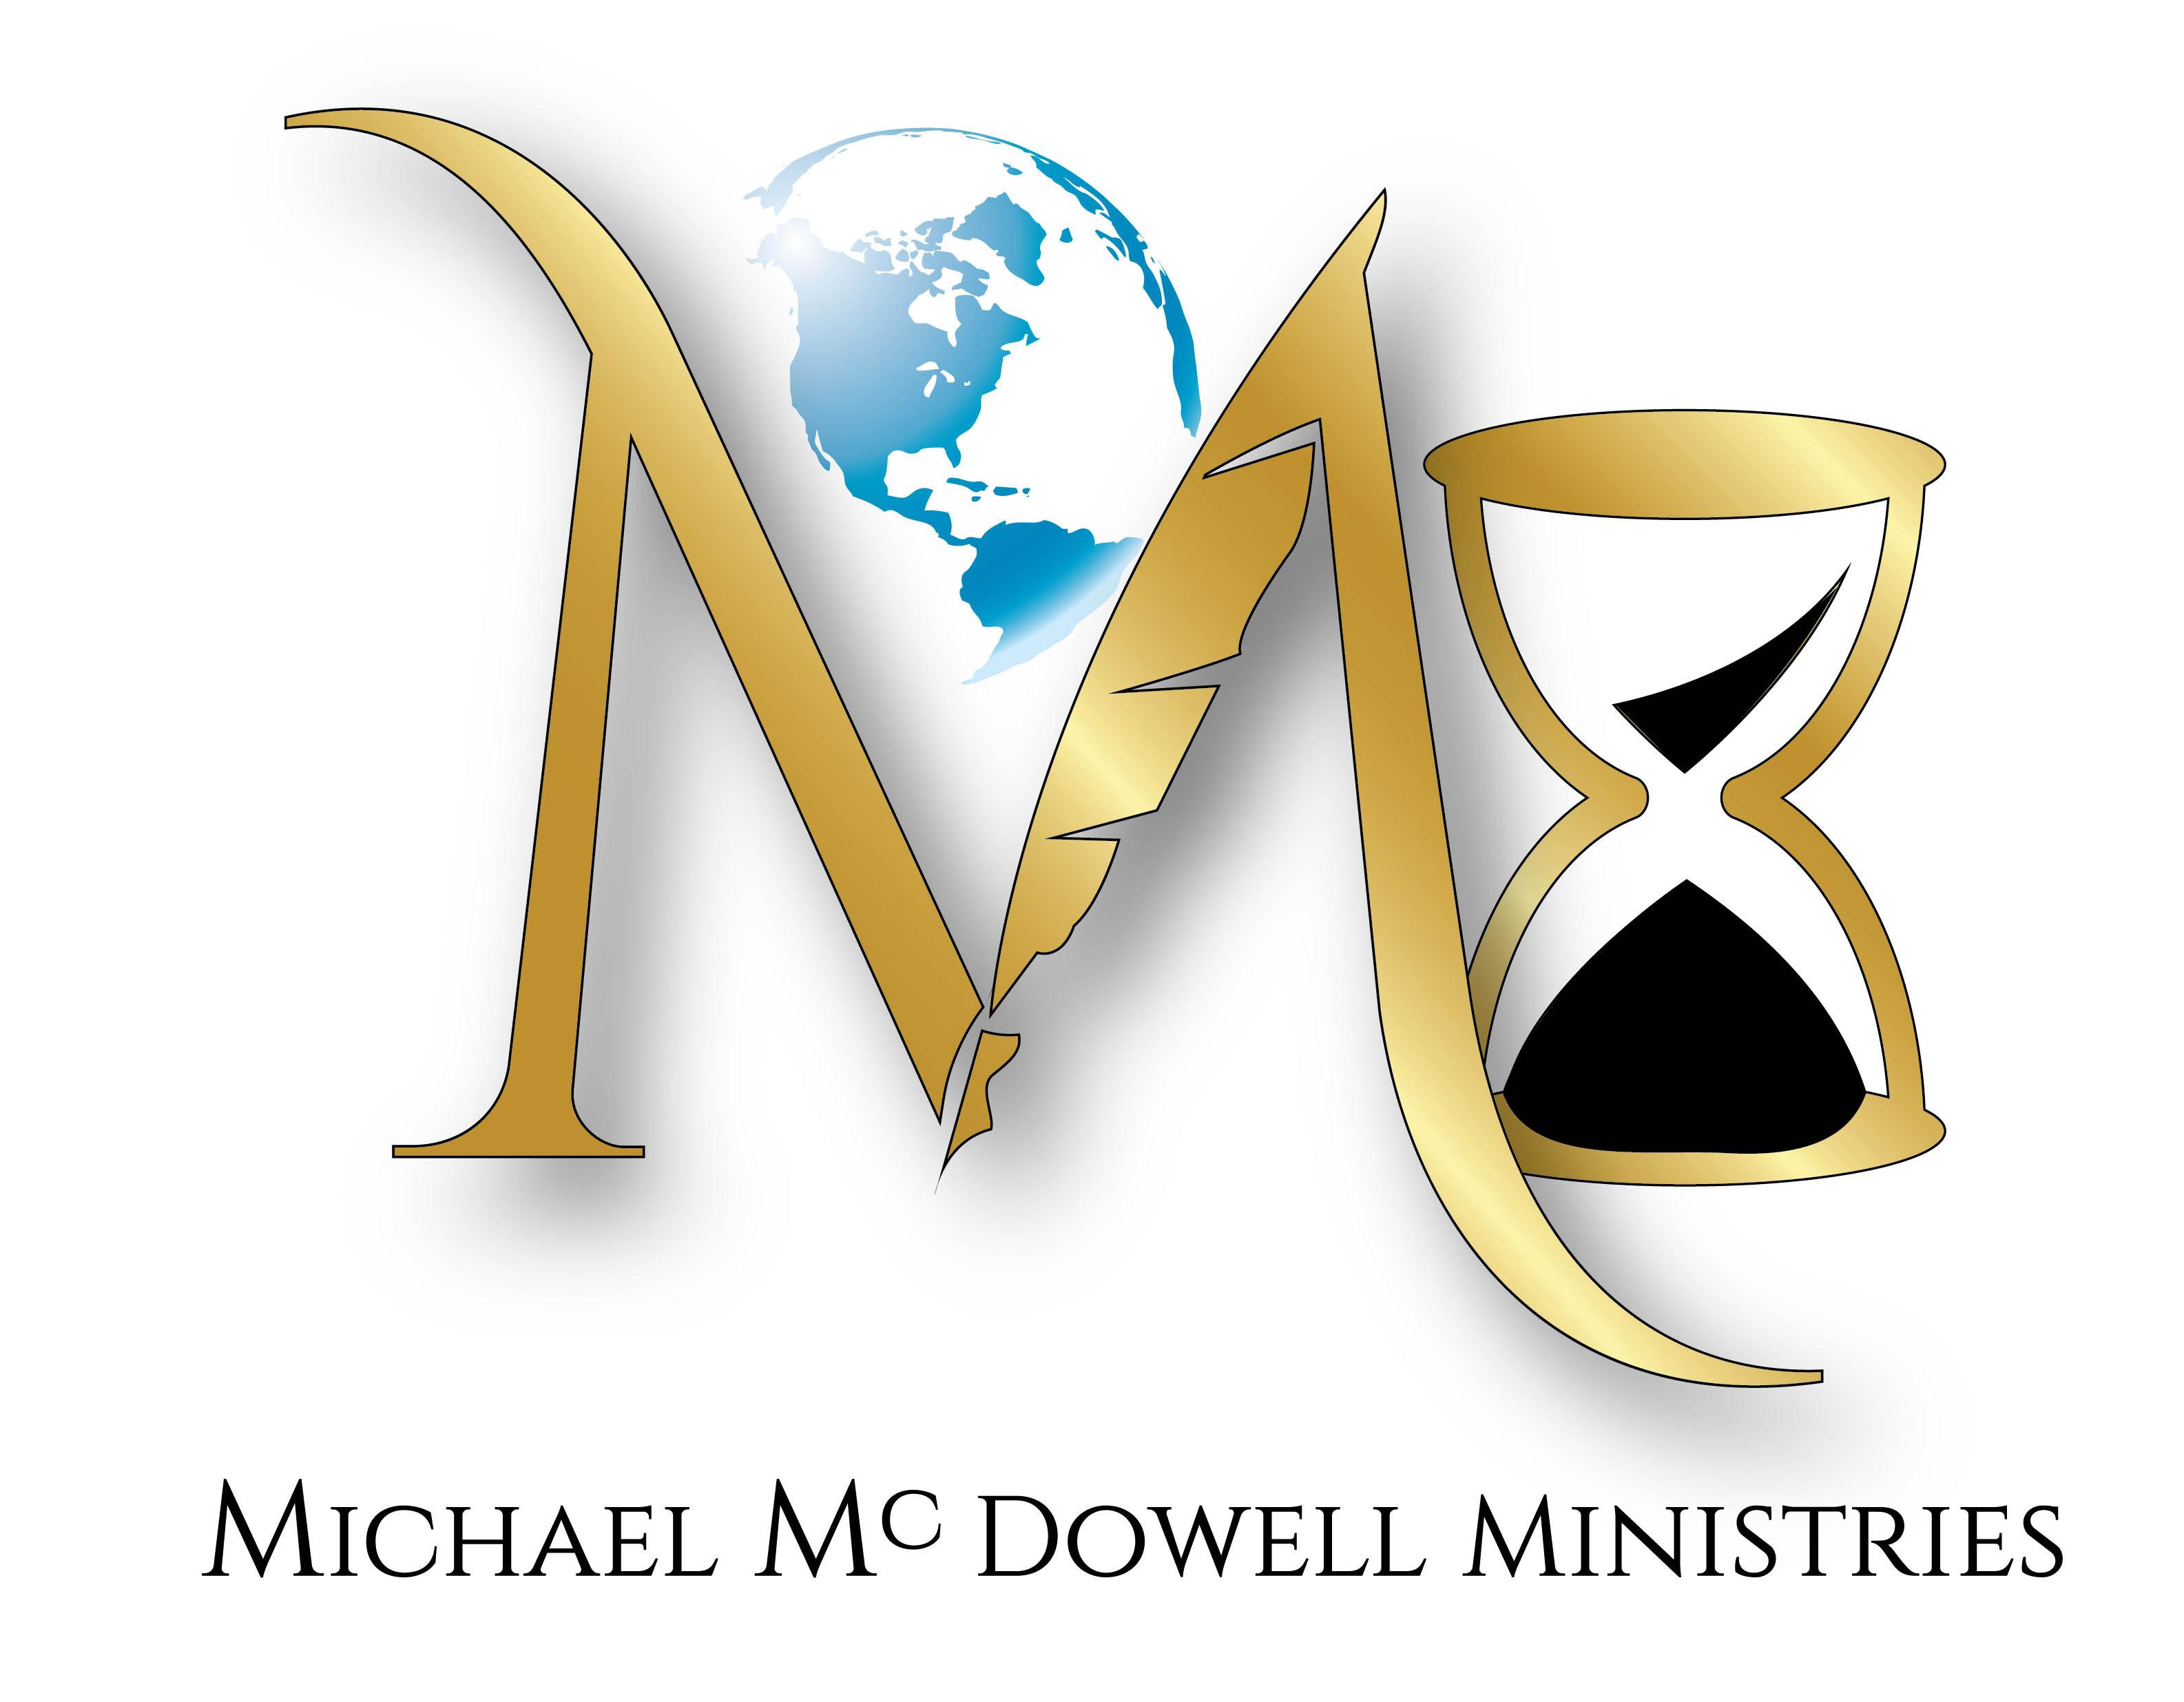 Michael McDowell Ministries